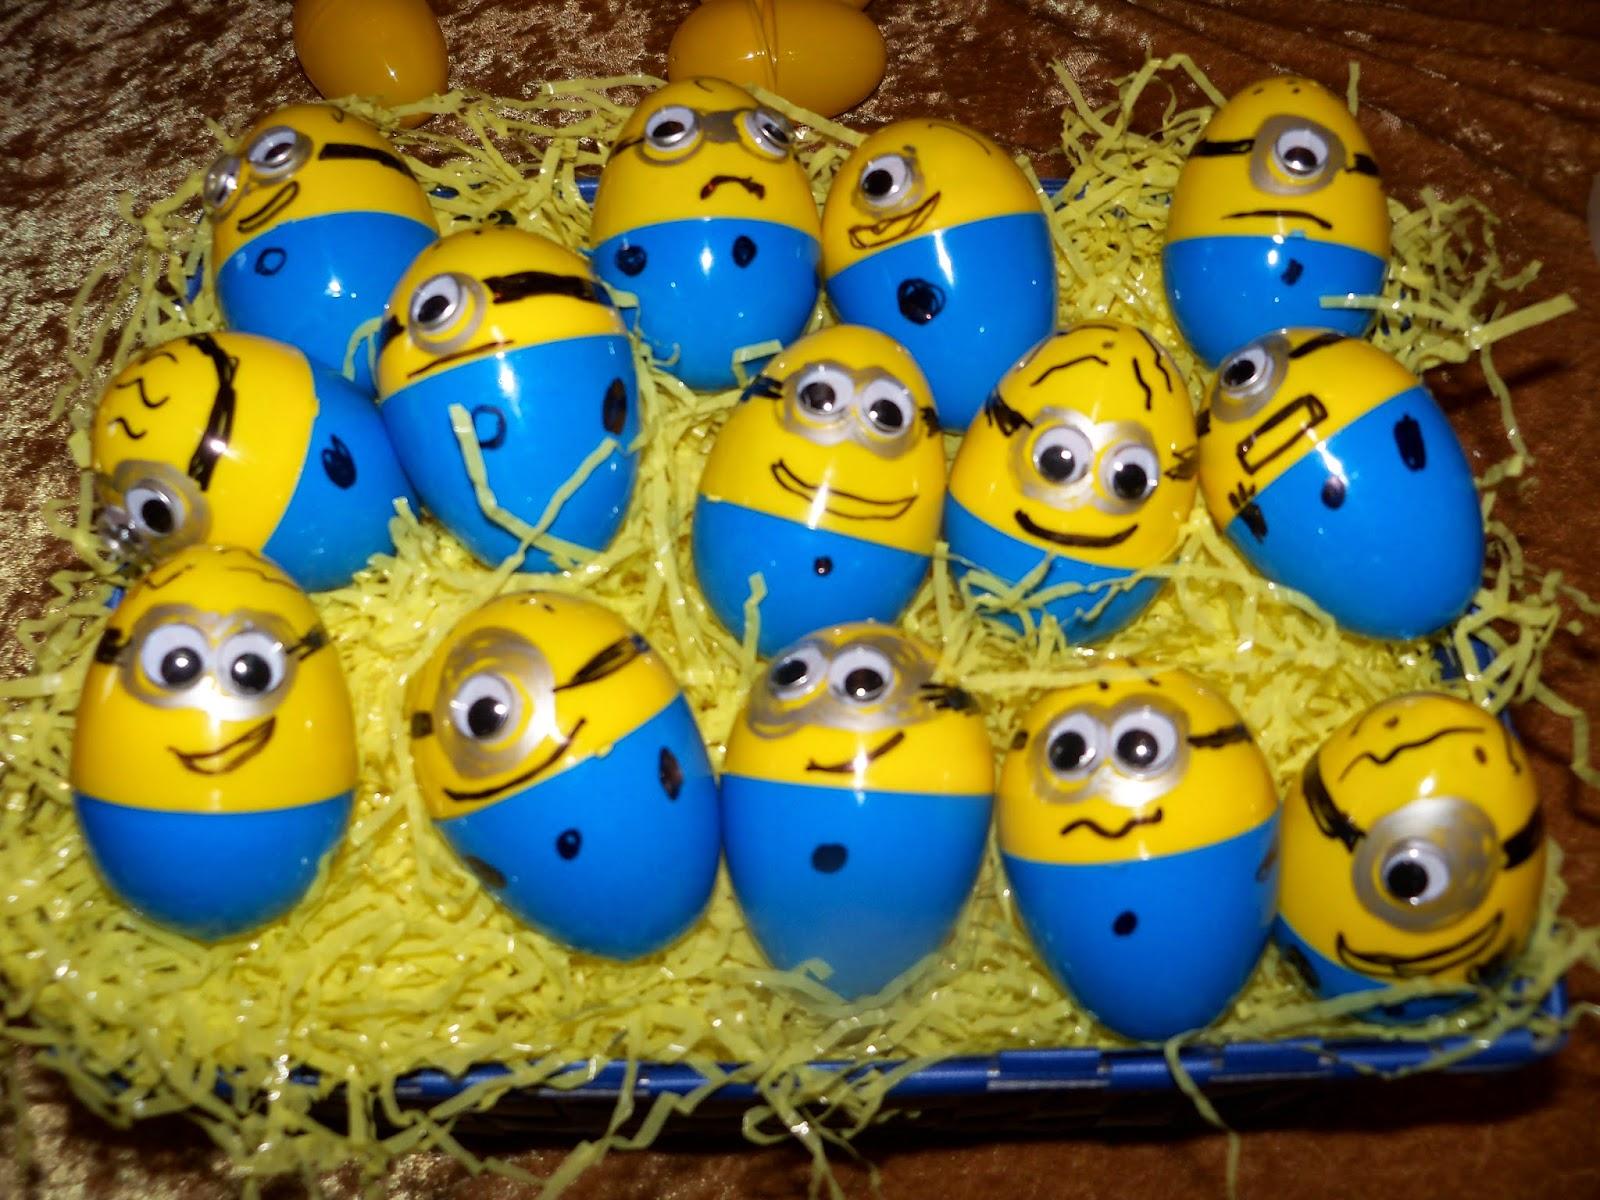 Egg Character Design Ideas : Cyndaverse these minion eggs make me happy